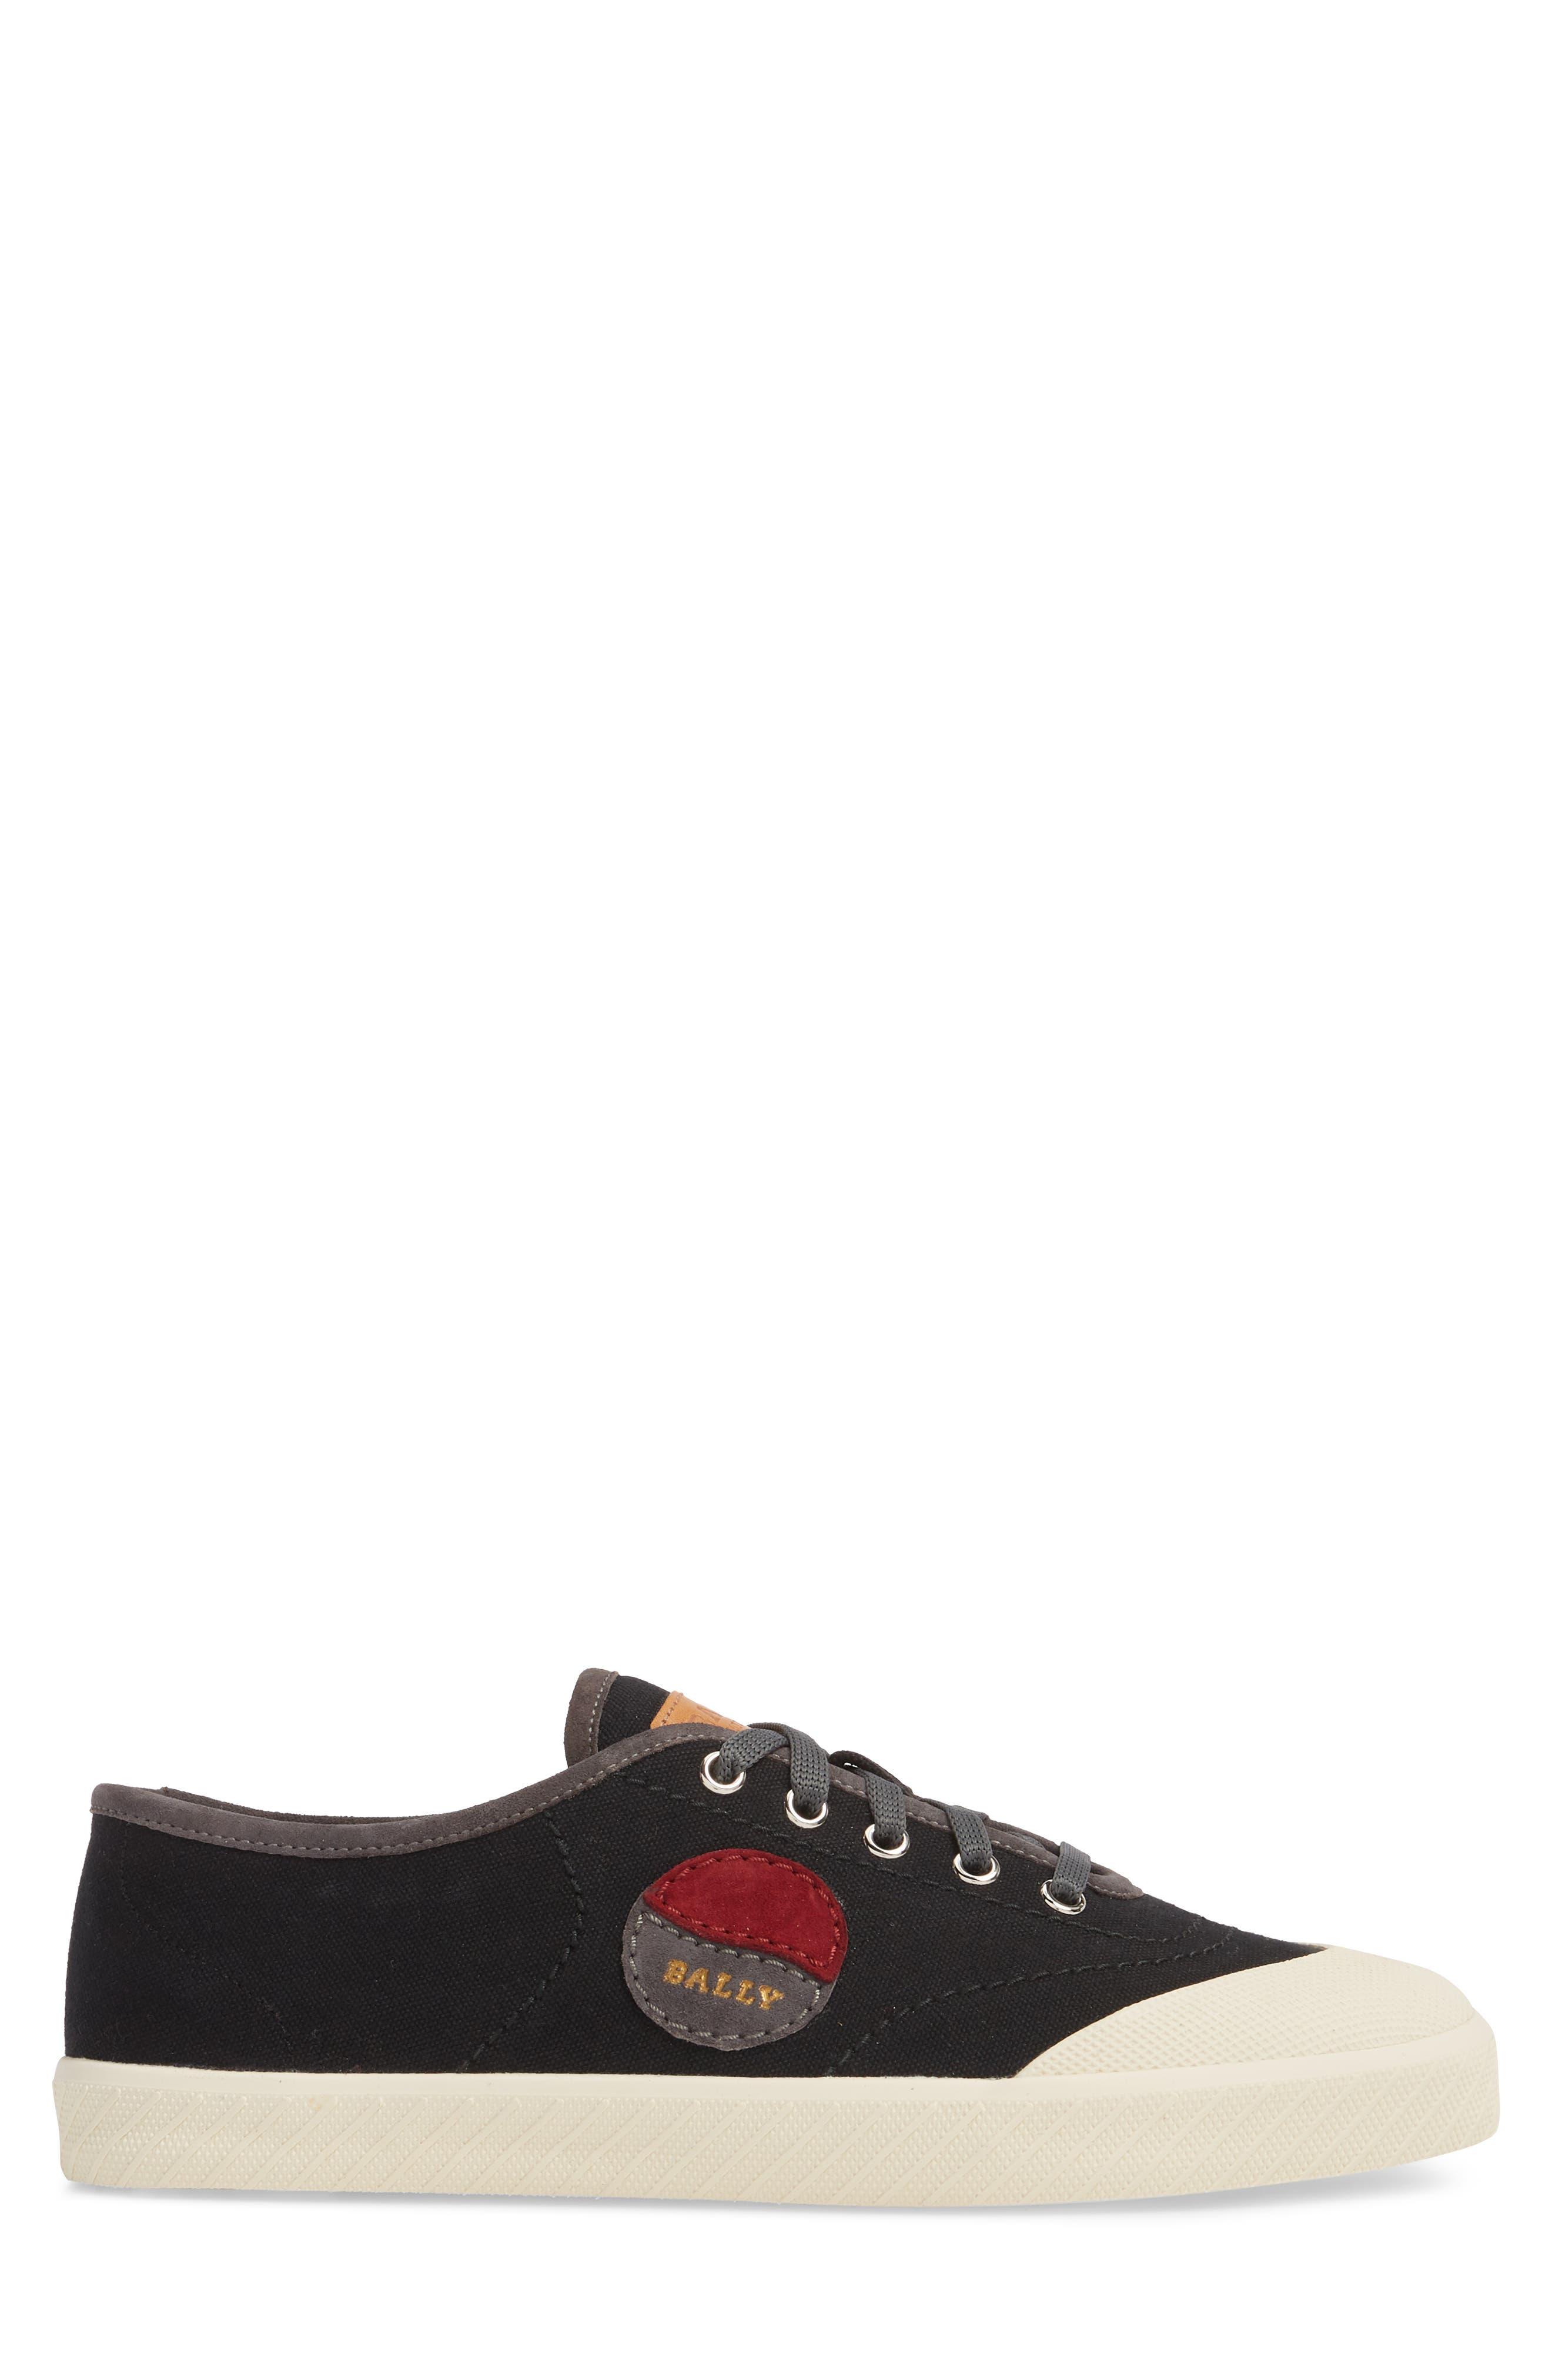 Silio Low Top Sneaker,                             Alternate thumbnail 3, color,                             001